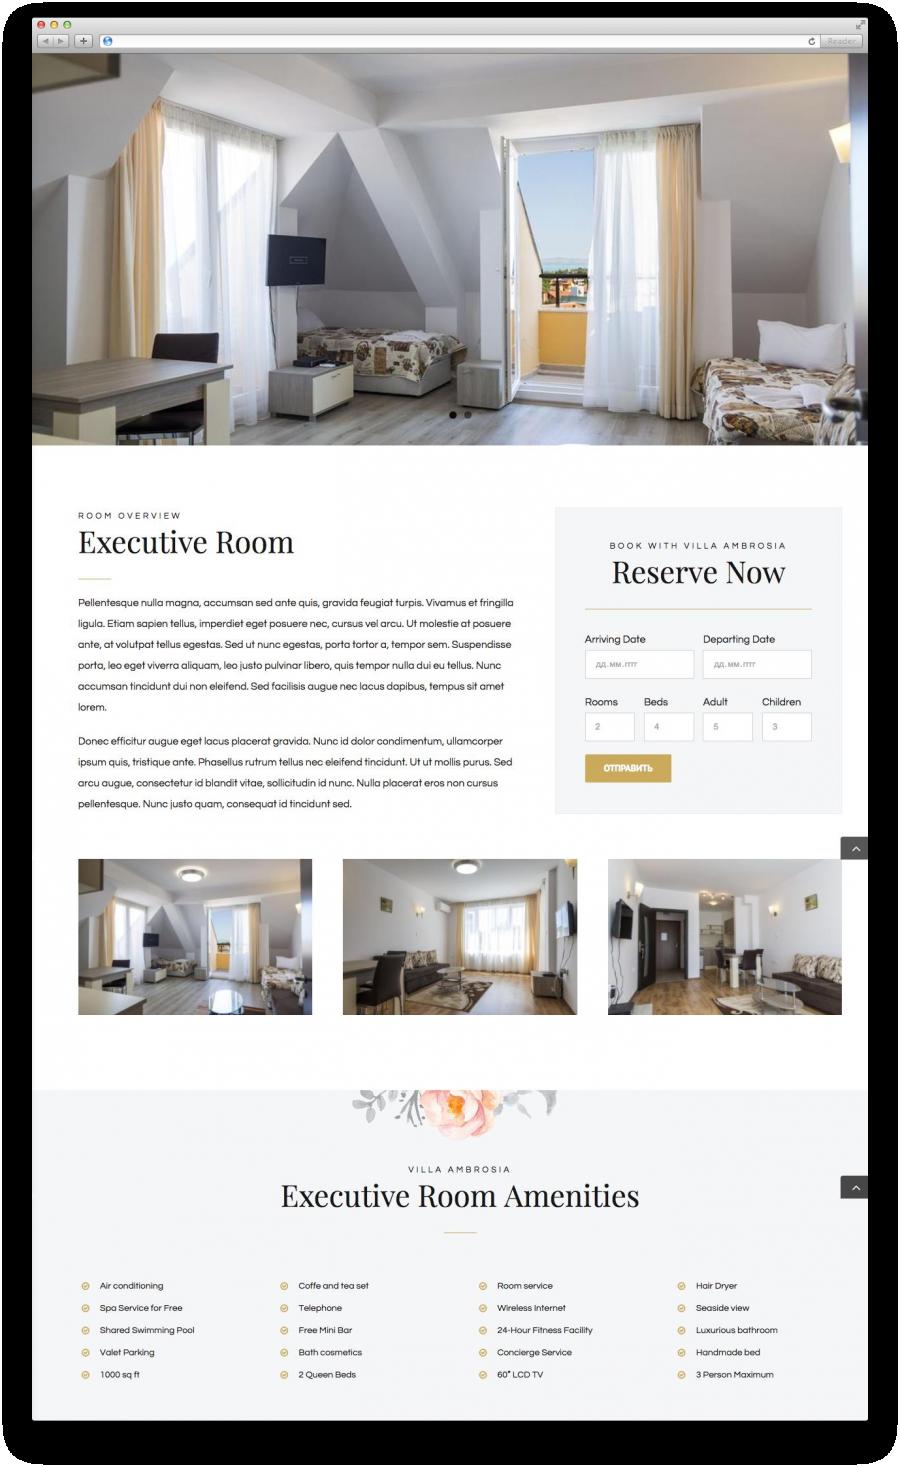 Описание апартаментов и форма заказа